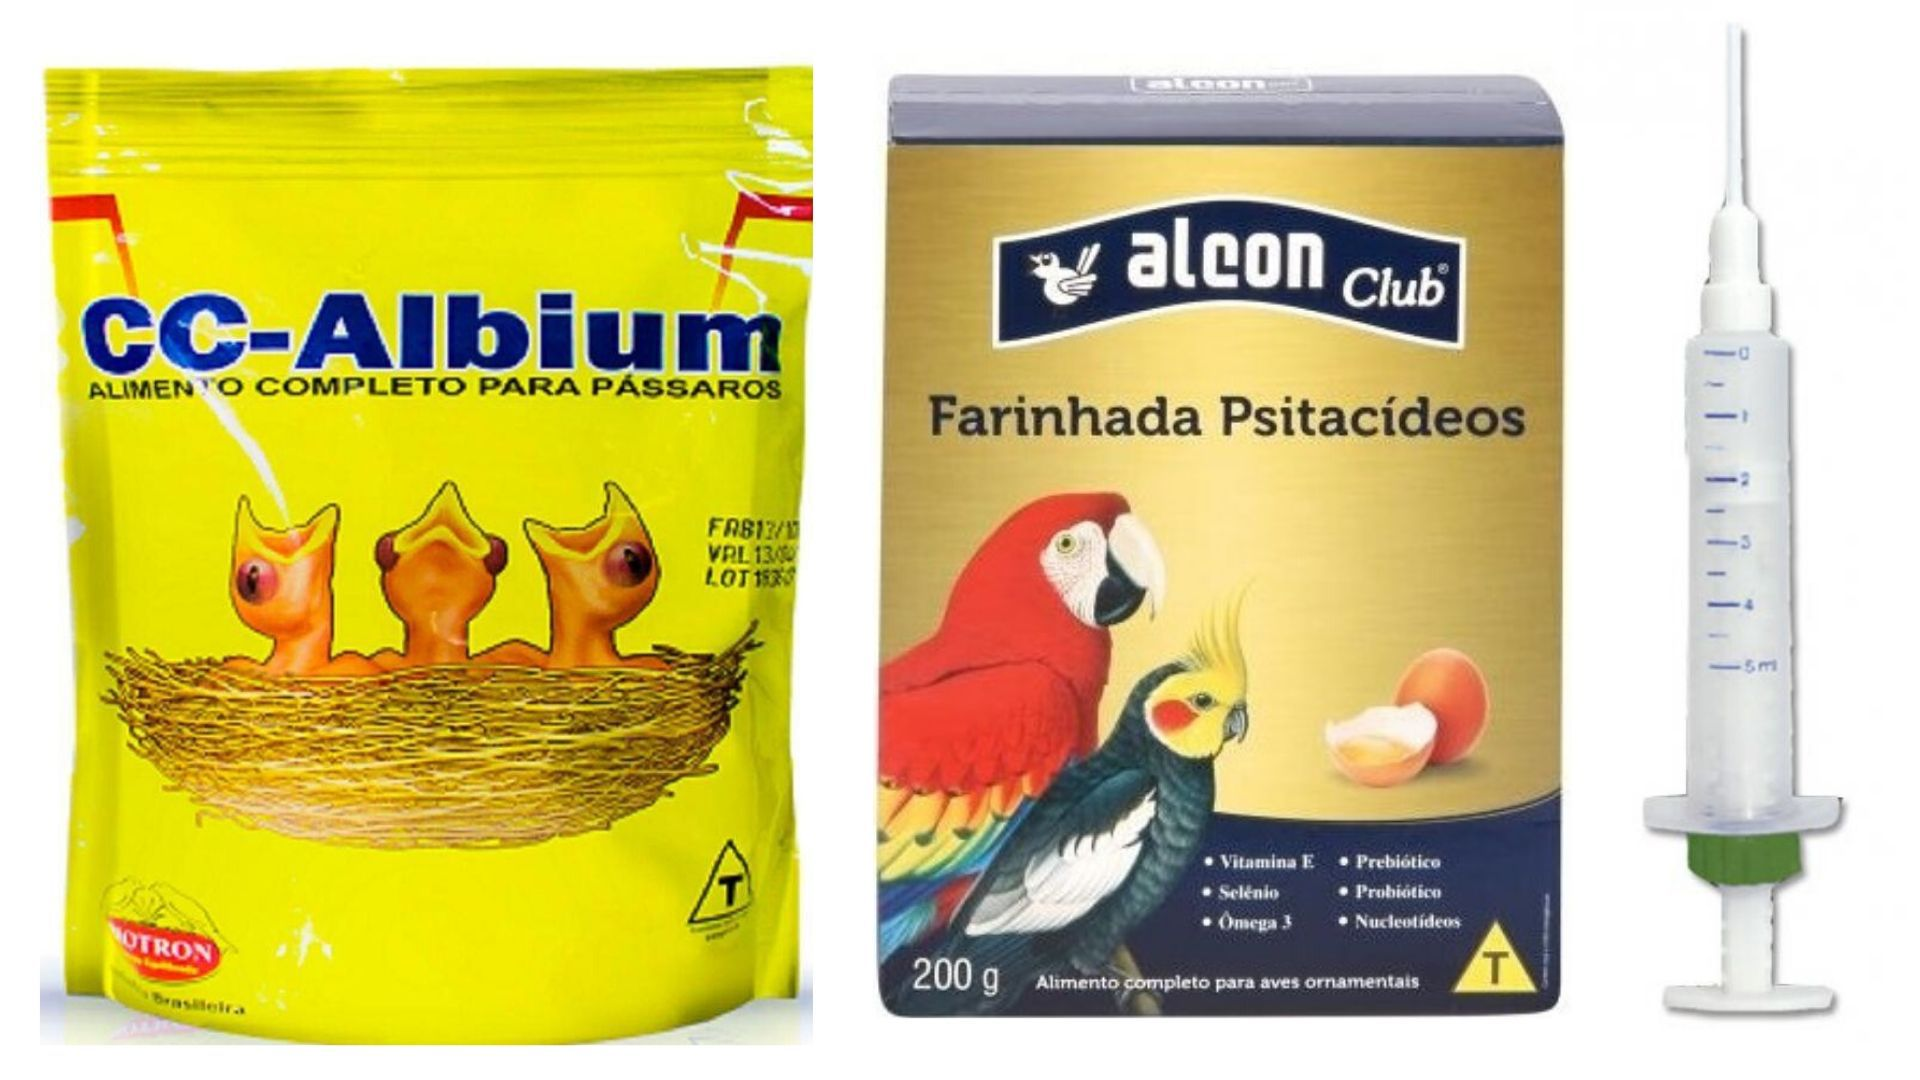 Papinha Pássaros Filhotes + Farinhada + Seringa P/ Tratar